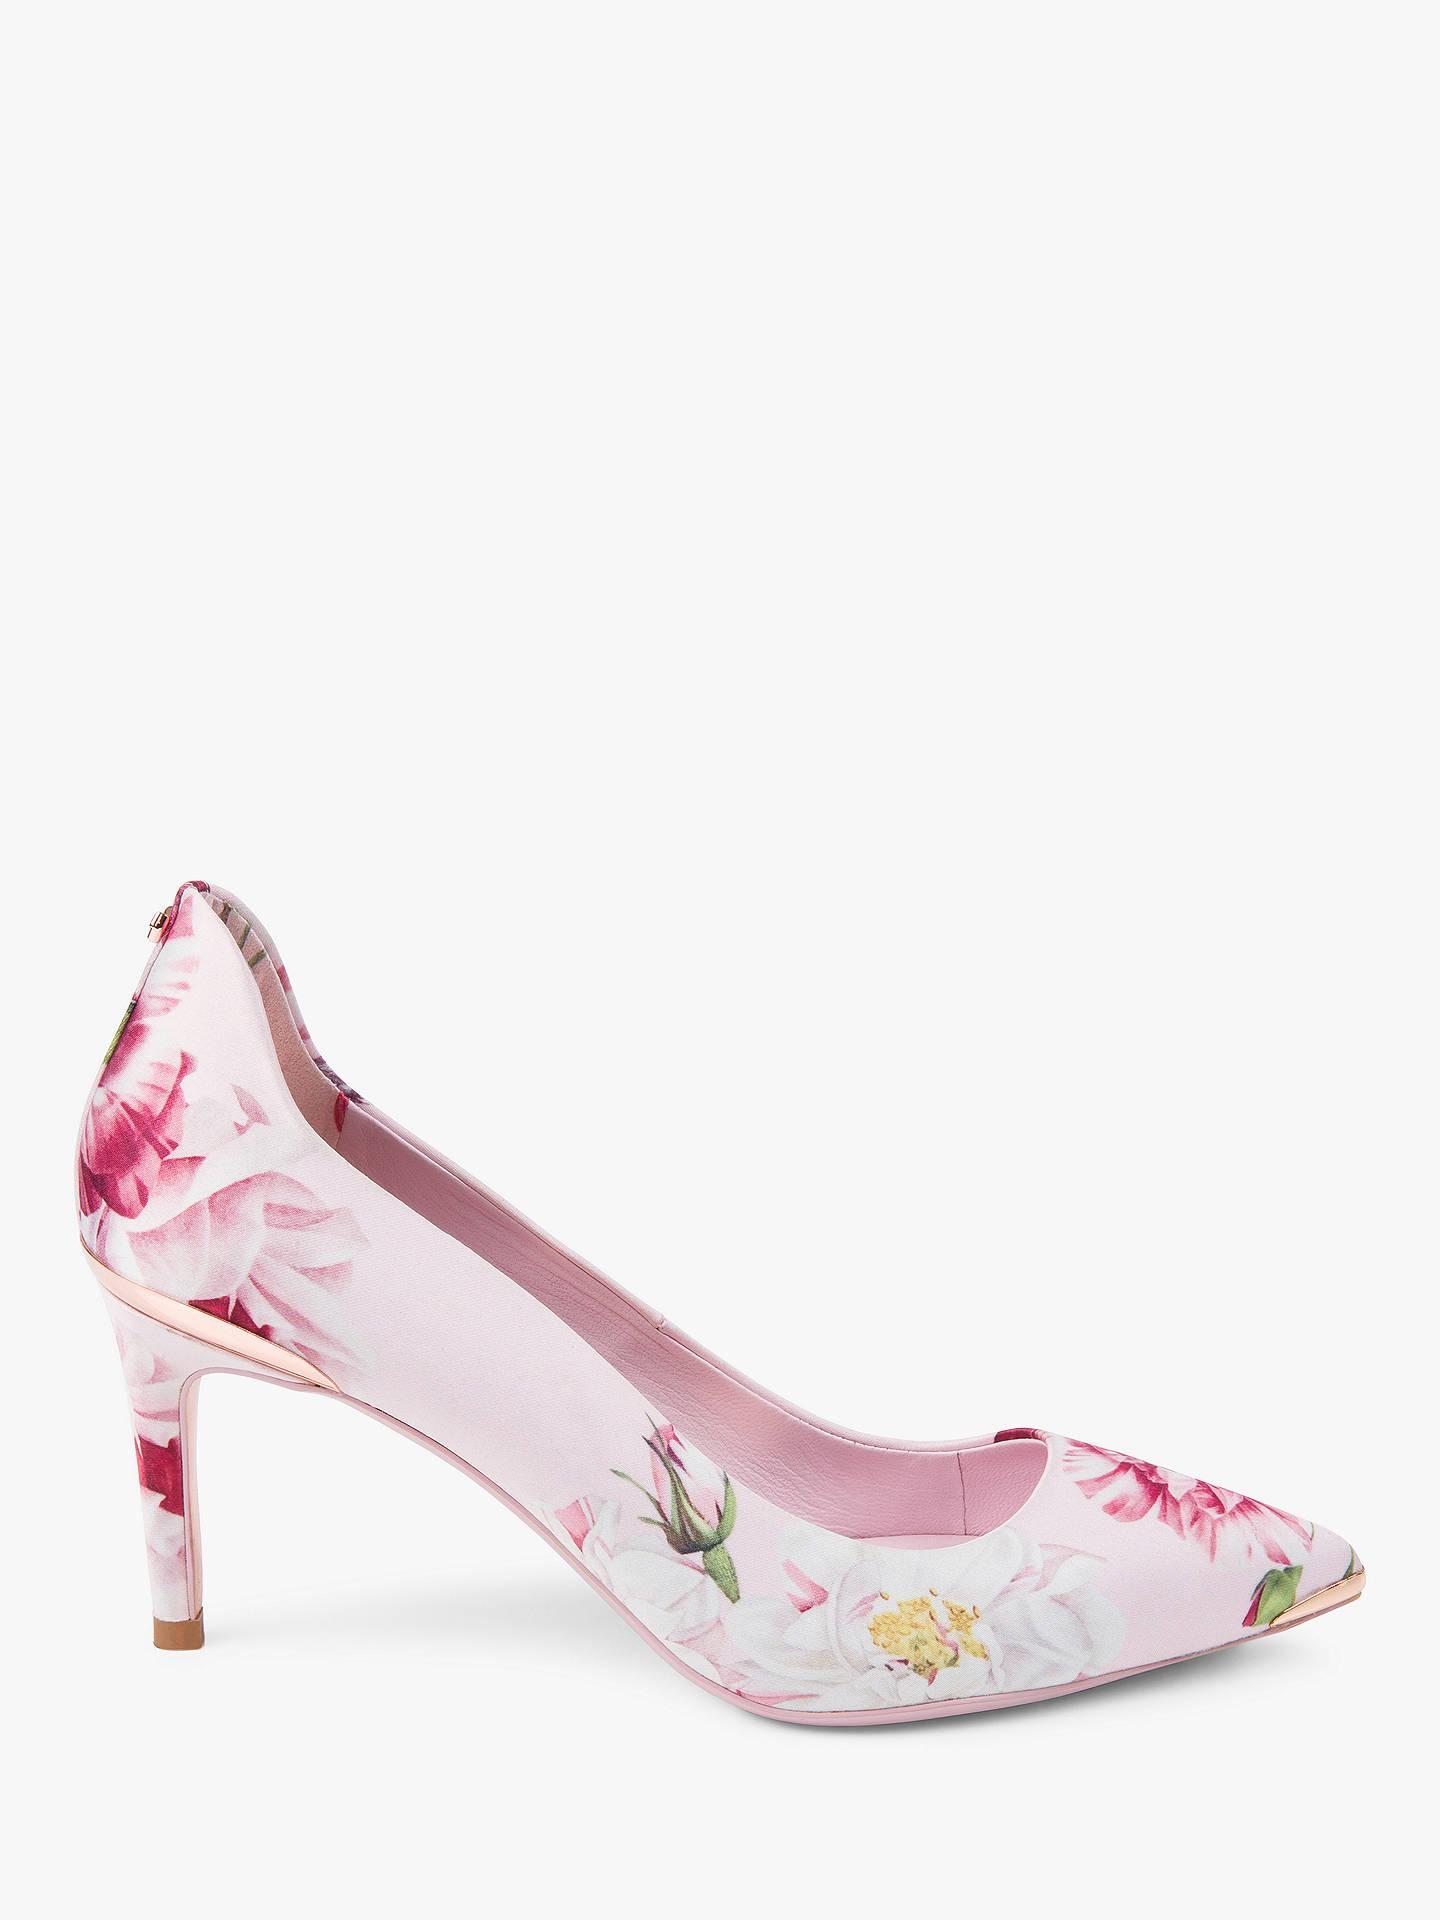 98ee4914459a Buy Ted Baker Viyxinp Stiletto Heel Court Shoes